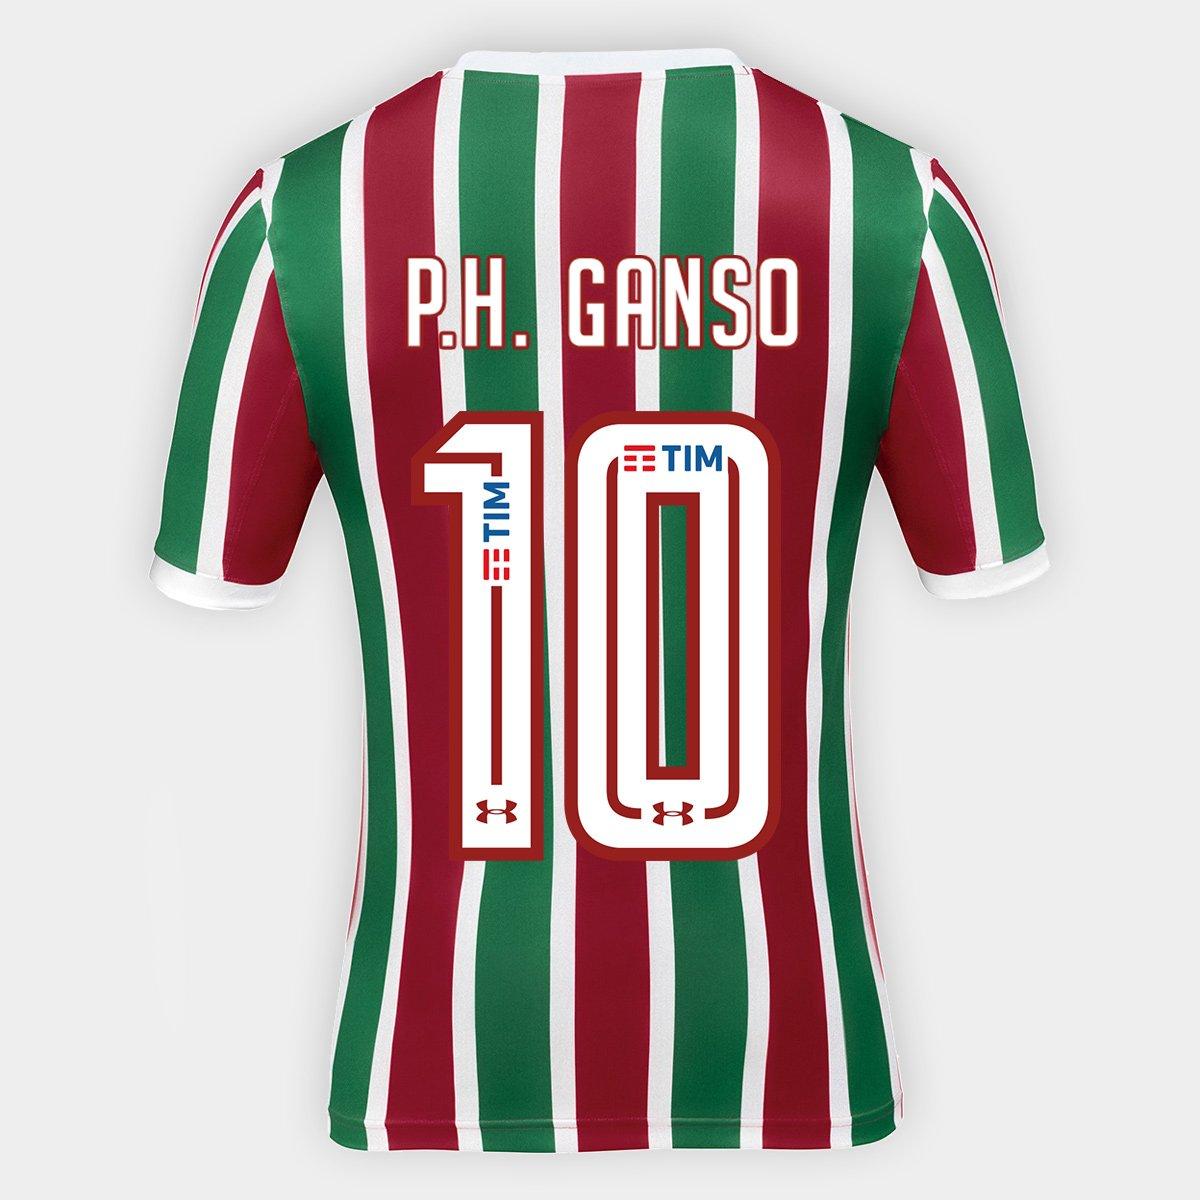 Official Fluminense Football Shirts & New Kit Releases